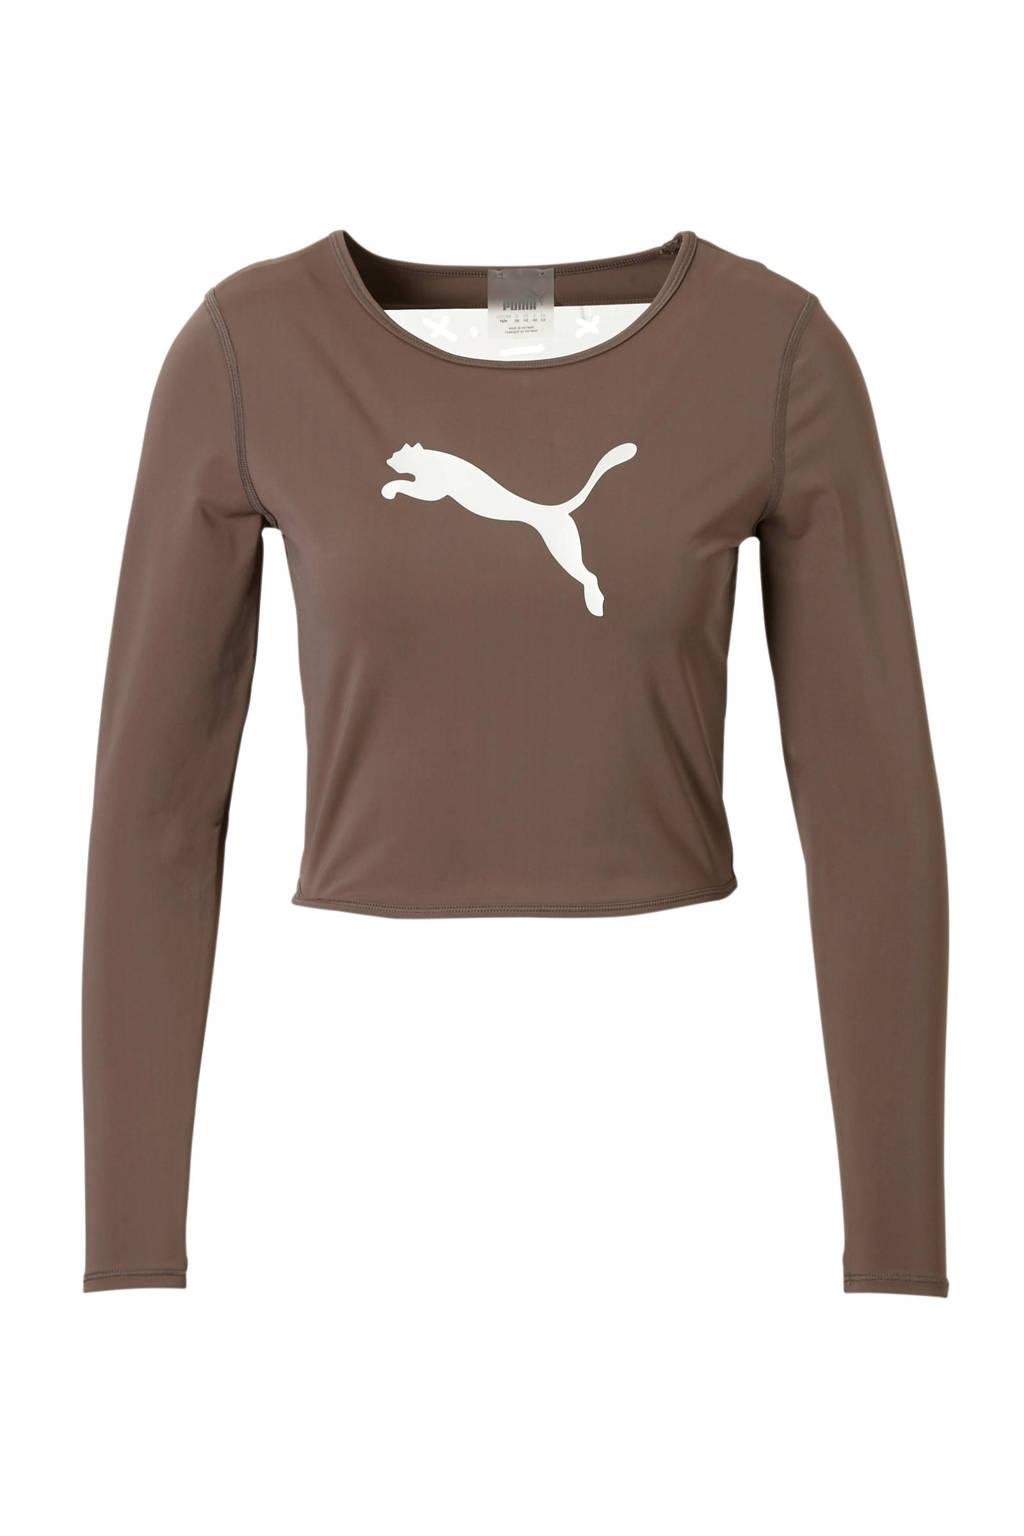 Puma sport T-shirt taupe, Taupe